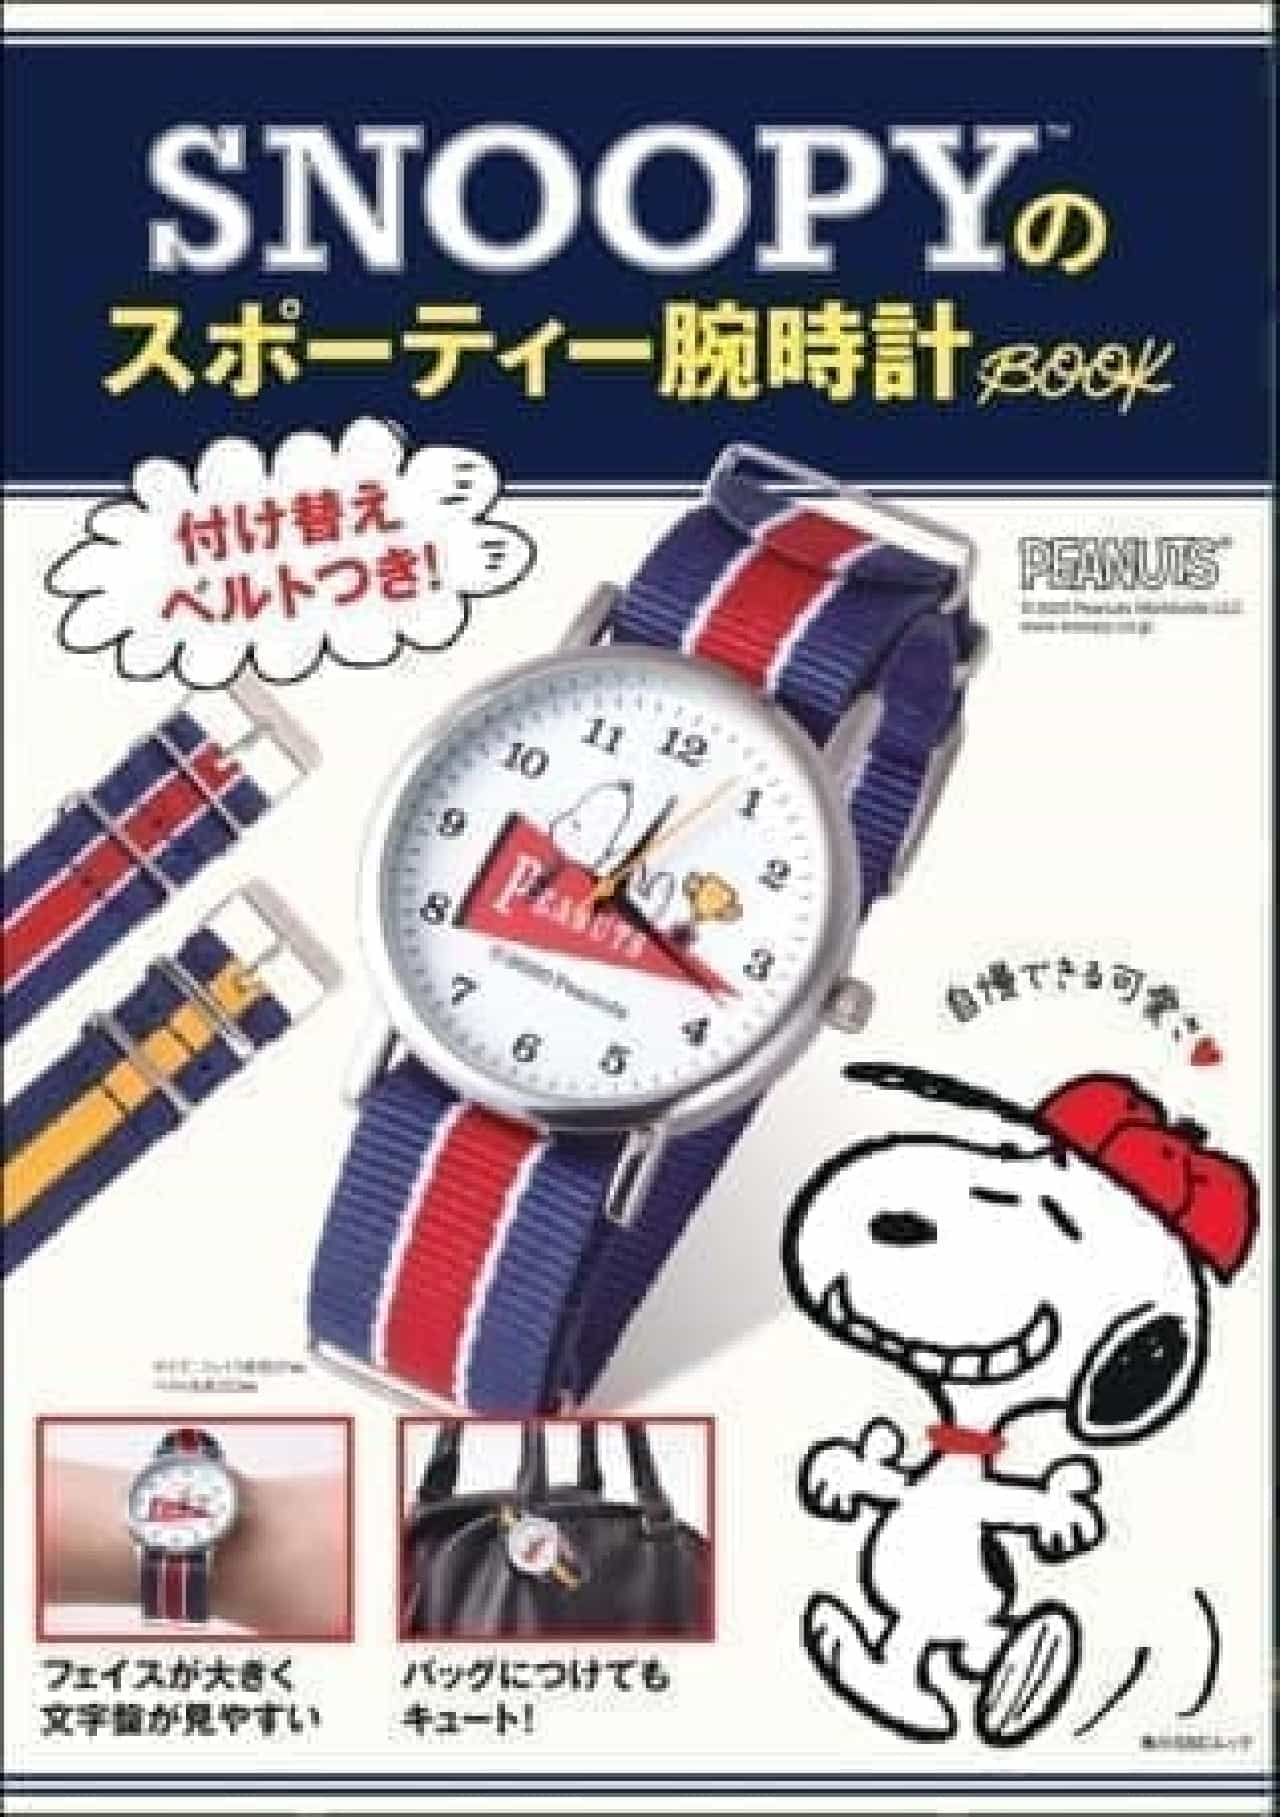 SNOOPYのスポーティー腕時計BOOK